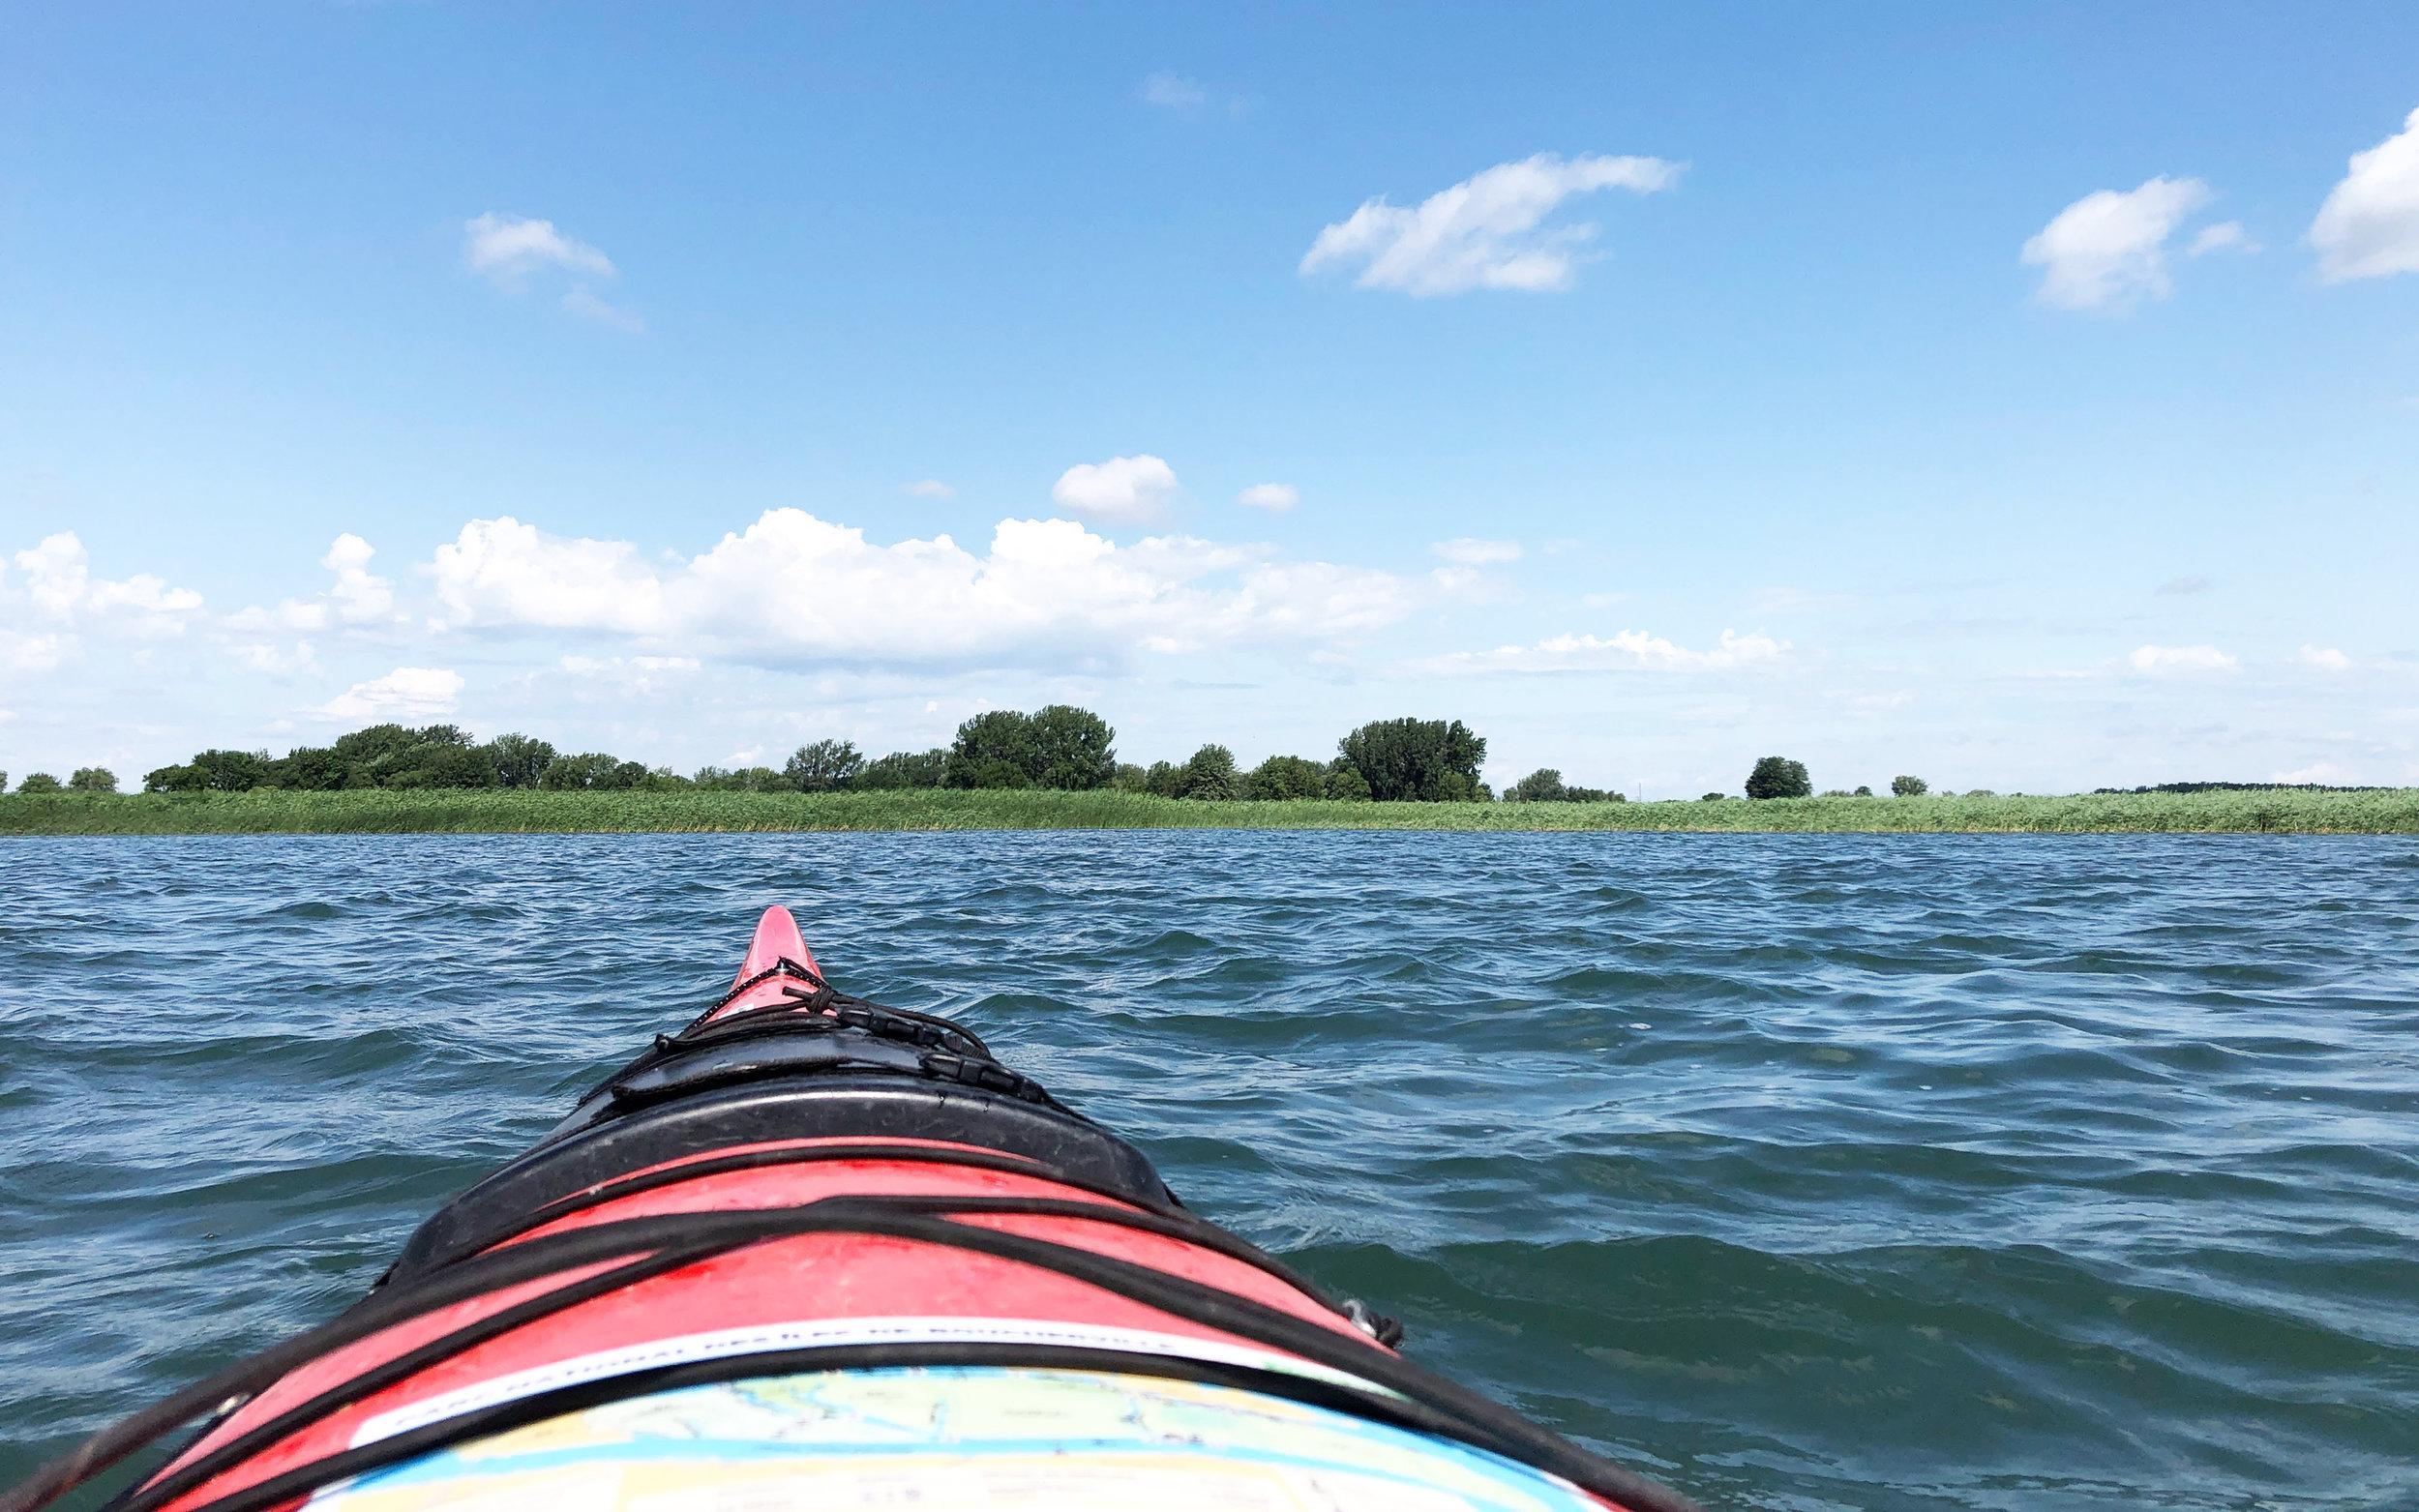 Kayak at Îles-de-Boucherville National Park